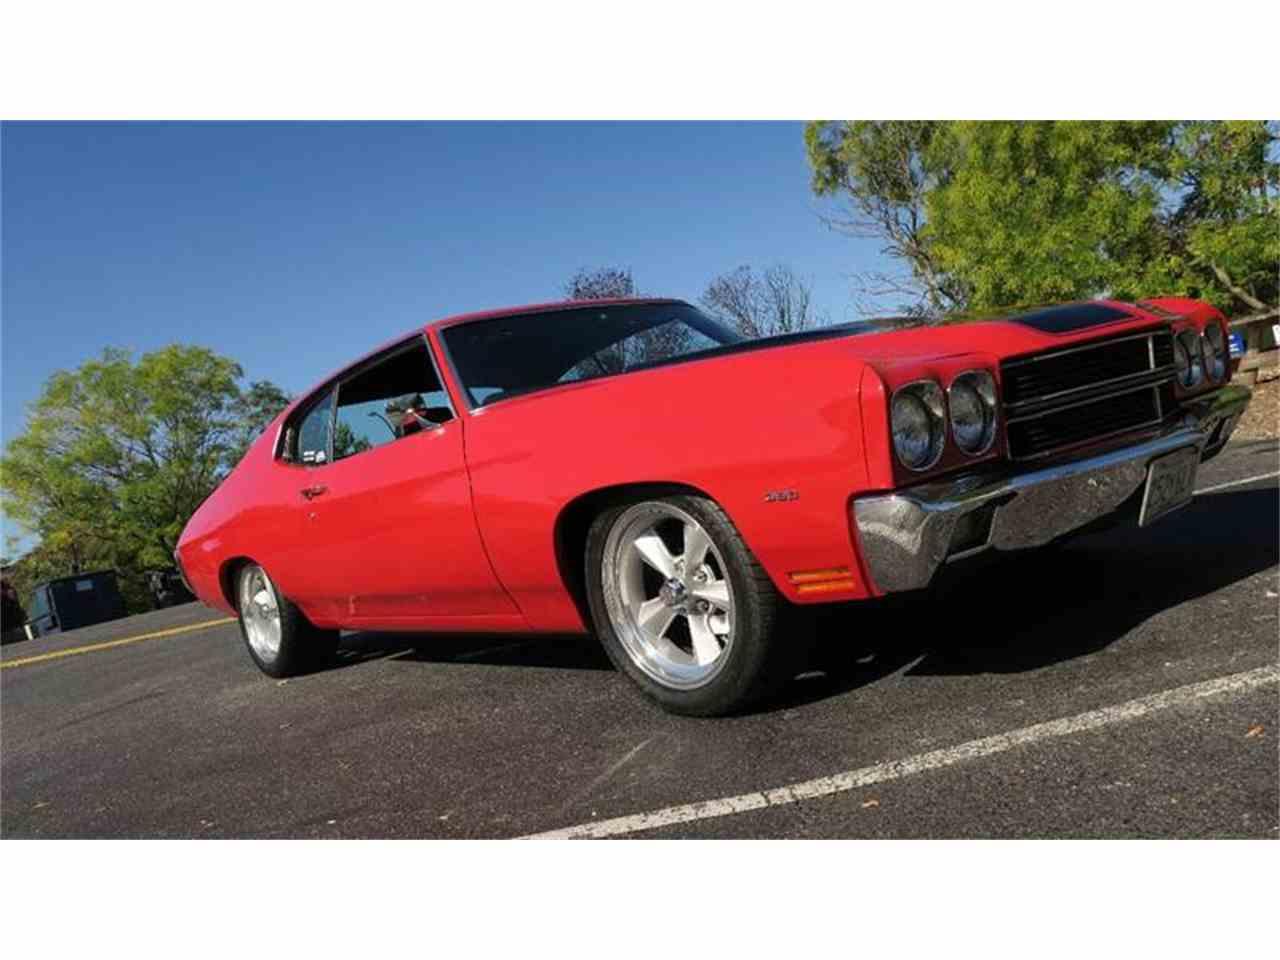 1970 Chevrolet Chevelle for Sale | ClassicCars.com | CC-1055378